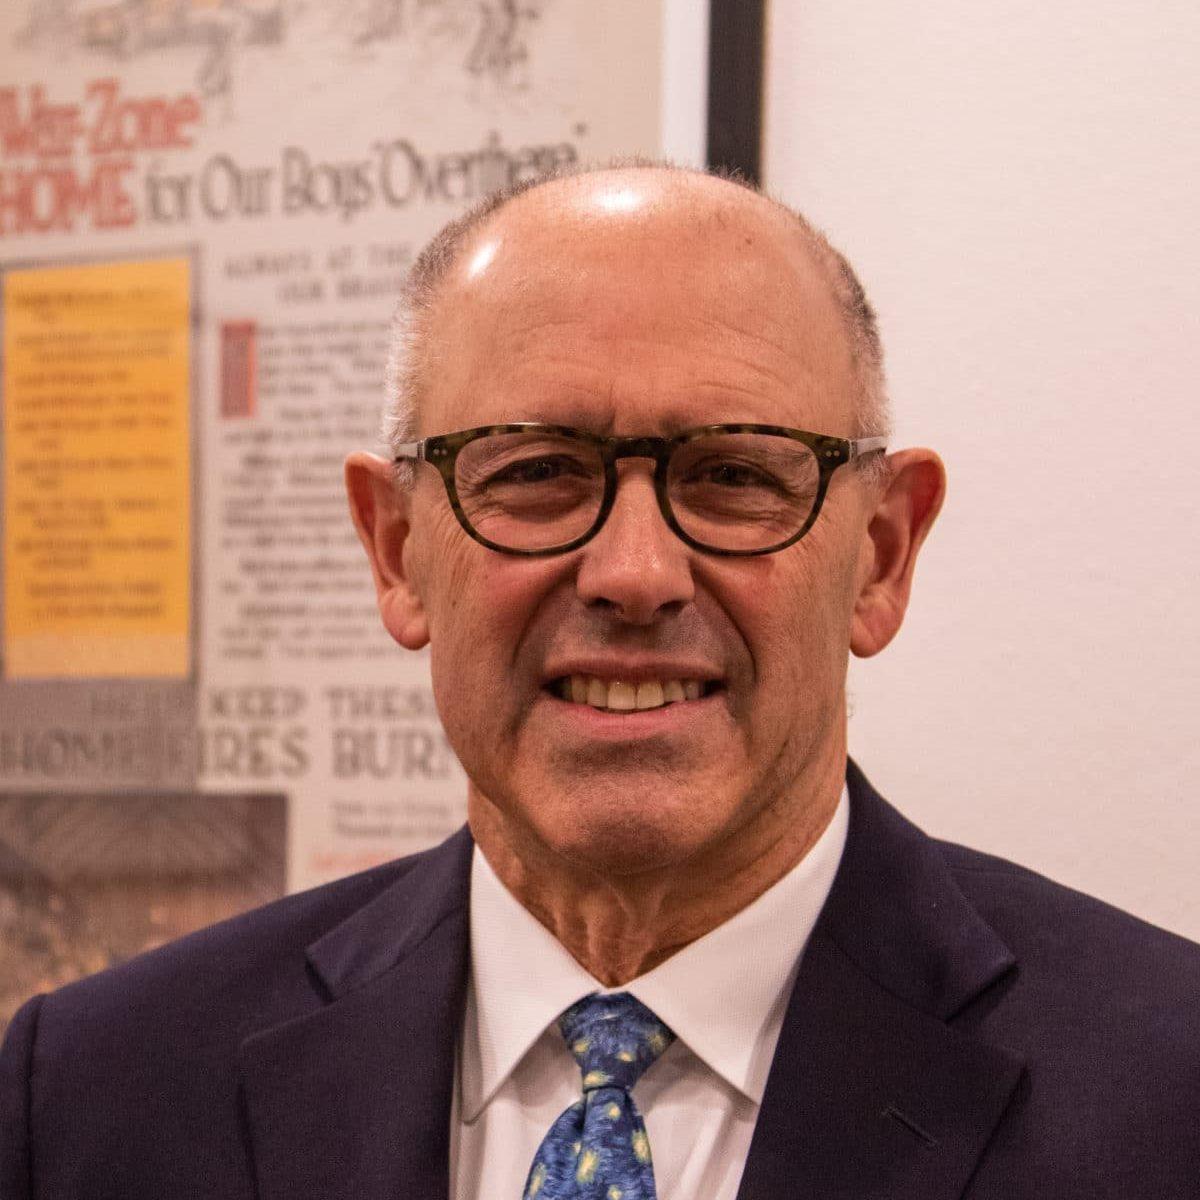 James Berg